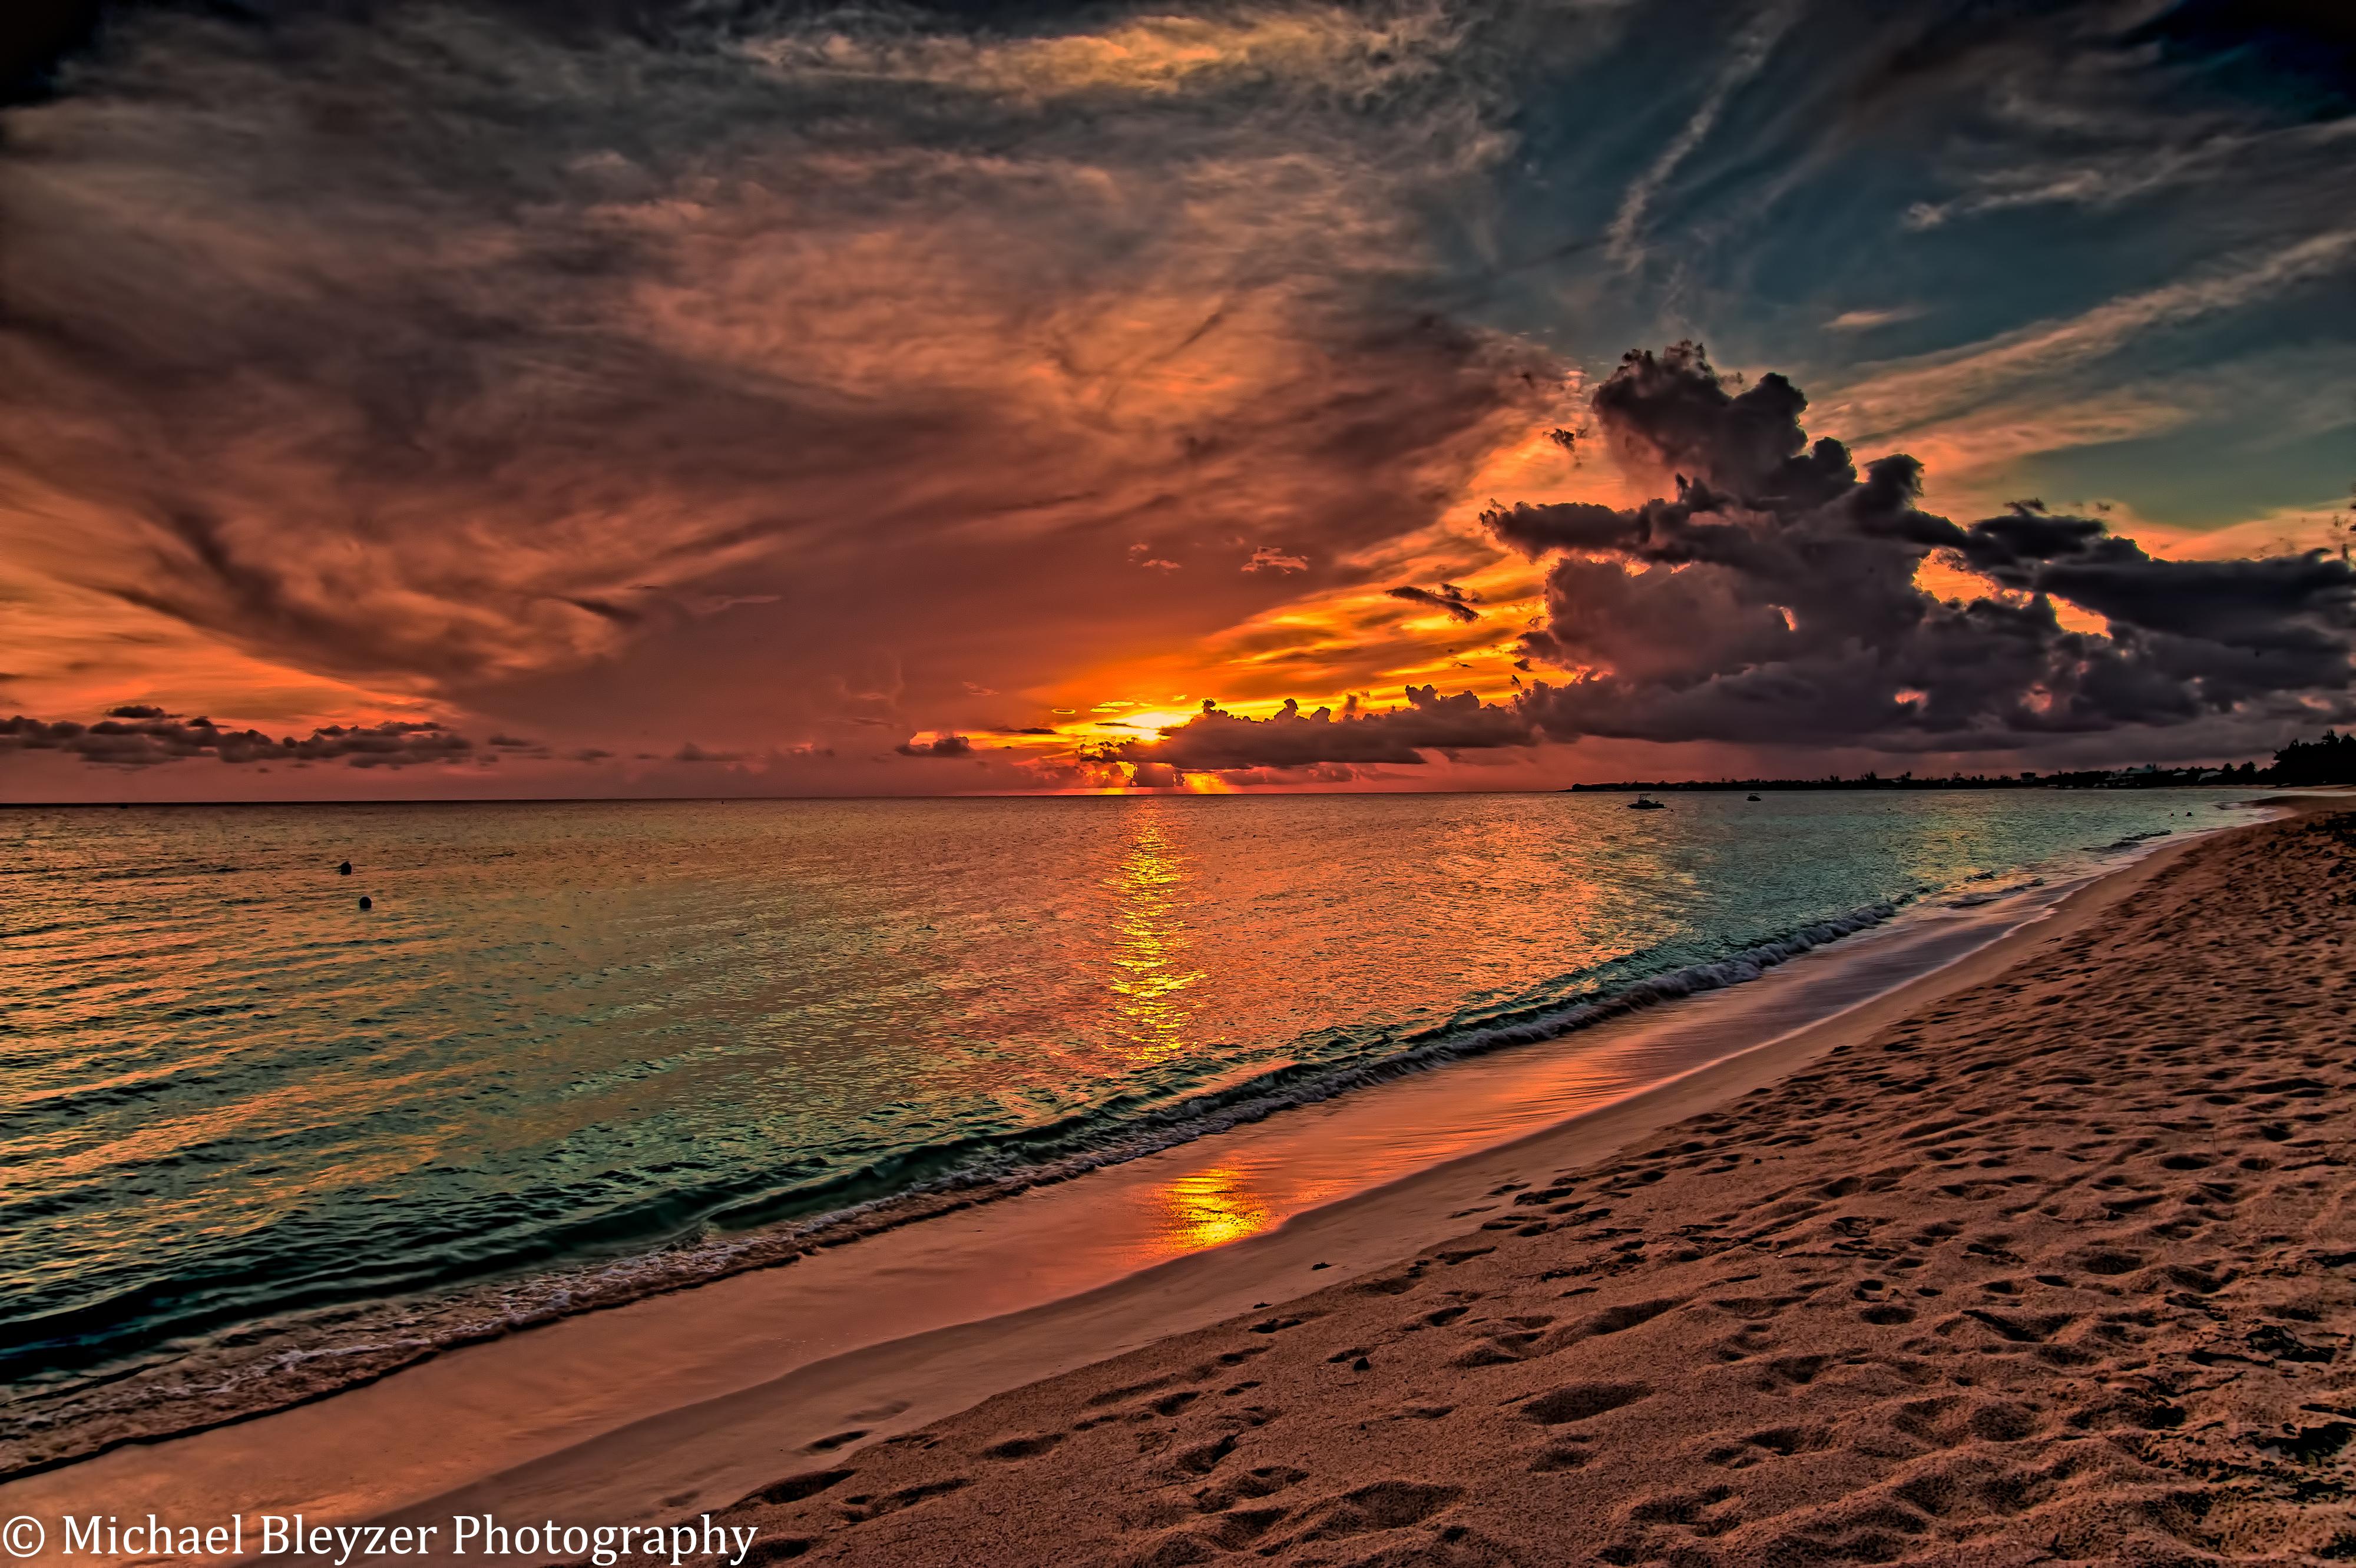 Cayman Islands Sunrise Sunset Times on sunset beach house, sunset boca raton florida, mark cuban house in cayman, sunset resort grand cayman, sunset reef grand cayman, sunset house resort, sunset cove grand cayman, sunset house logo, sunset on water, sunset divers, sunset at the white house, sunset house florida, sunset beach grand cayman, sunset house london, sunset house george town, sunset house key west, sunset house roatan,